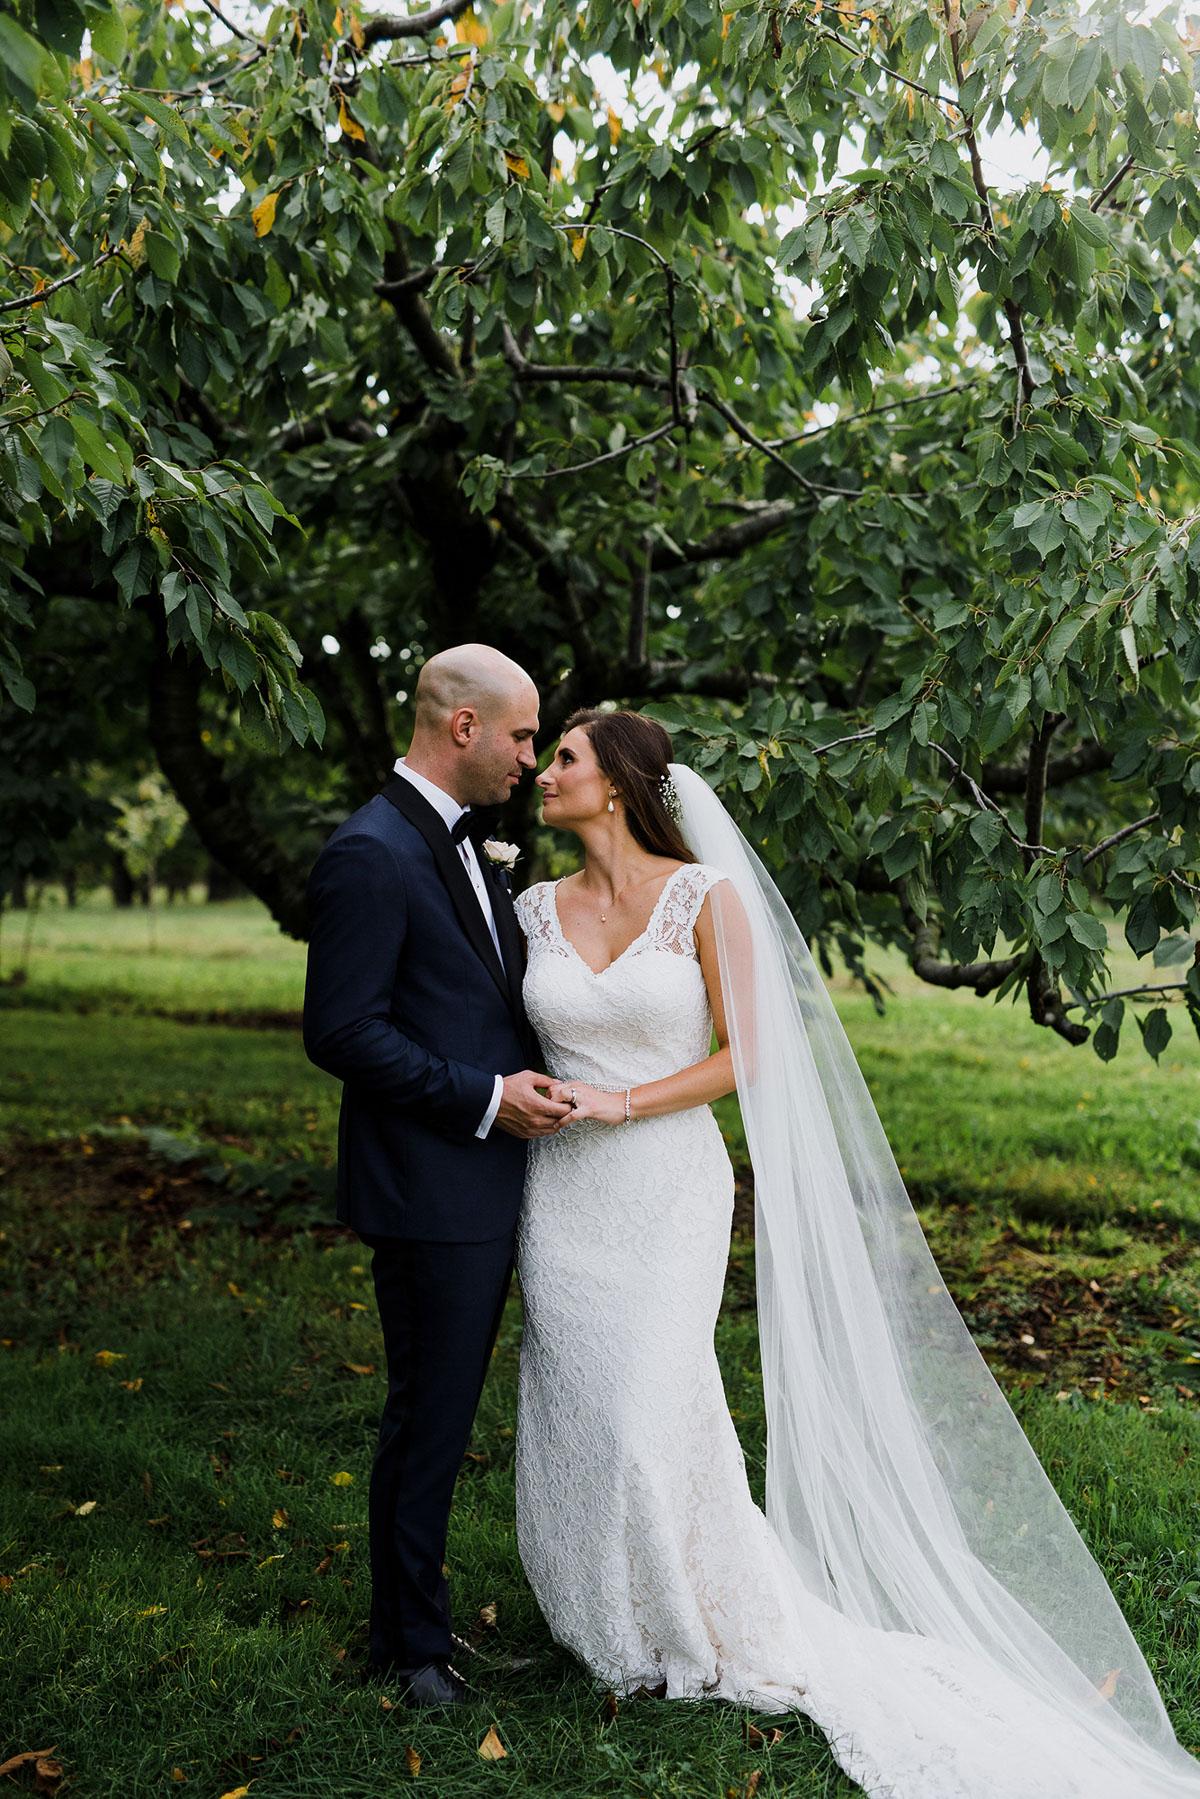 shaw-events-vineyard-bride-swish-list-kurtz-orchards-niagara-on-the-lake-wedding-50.jpg